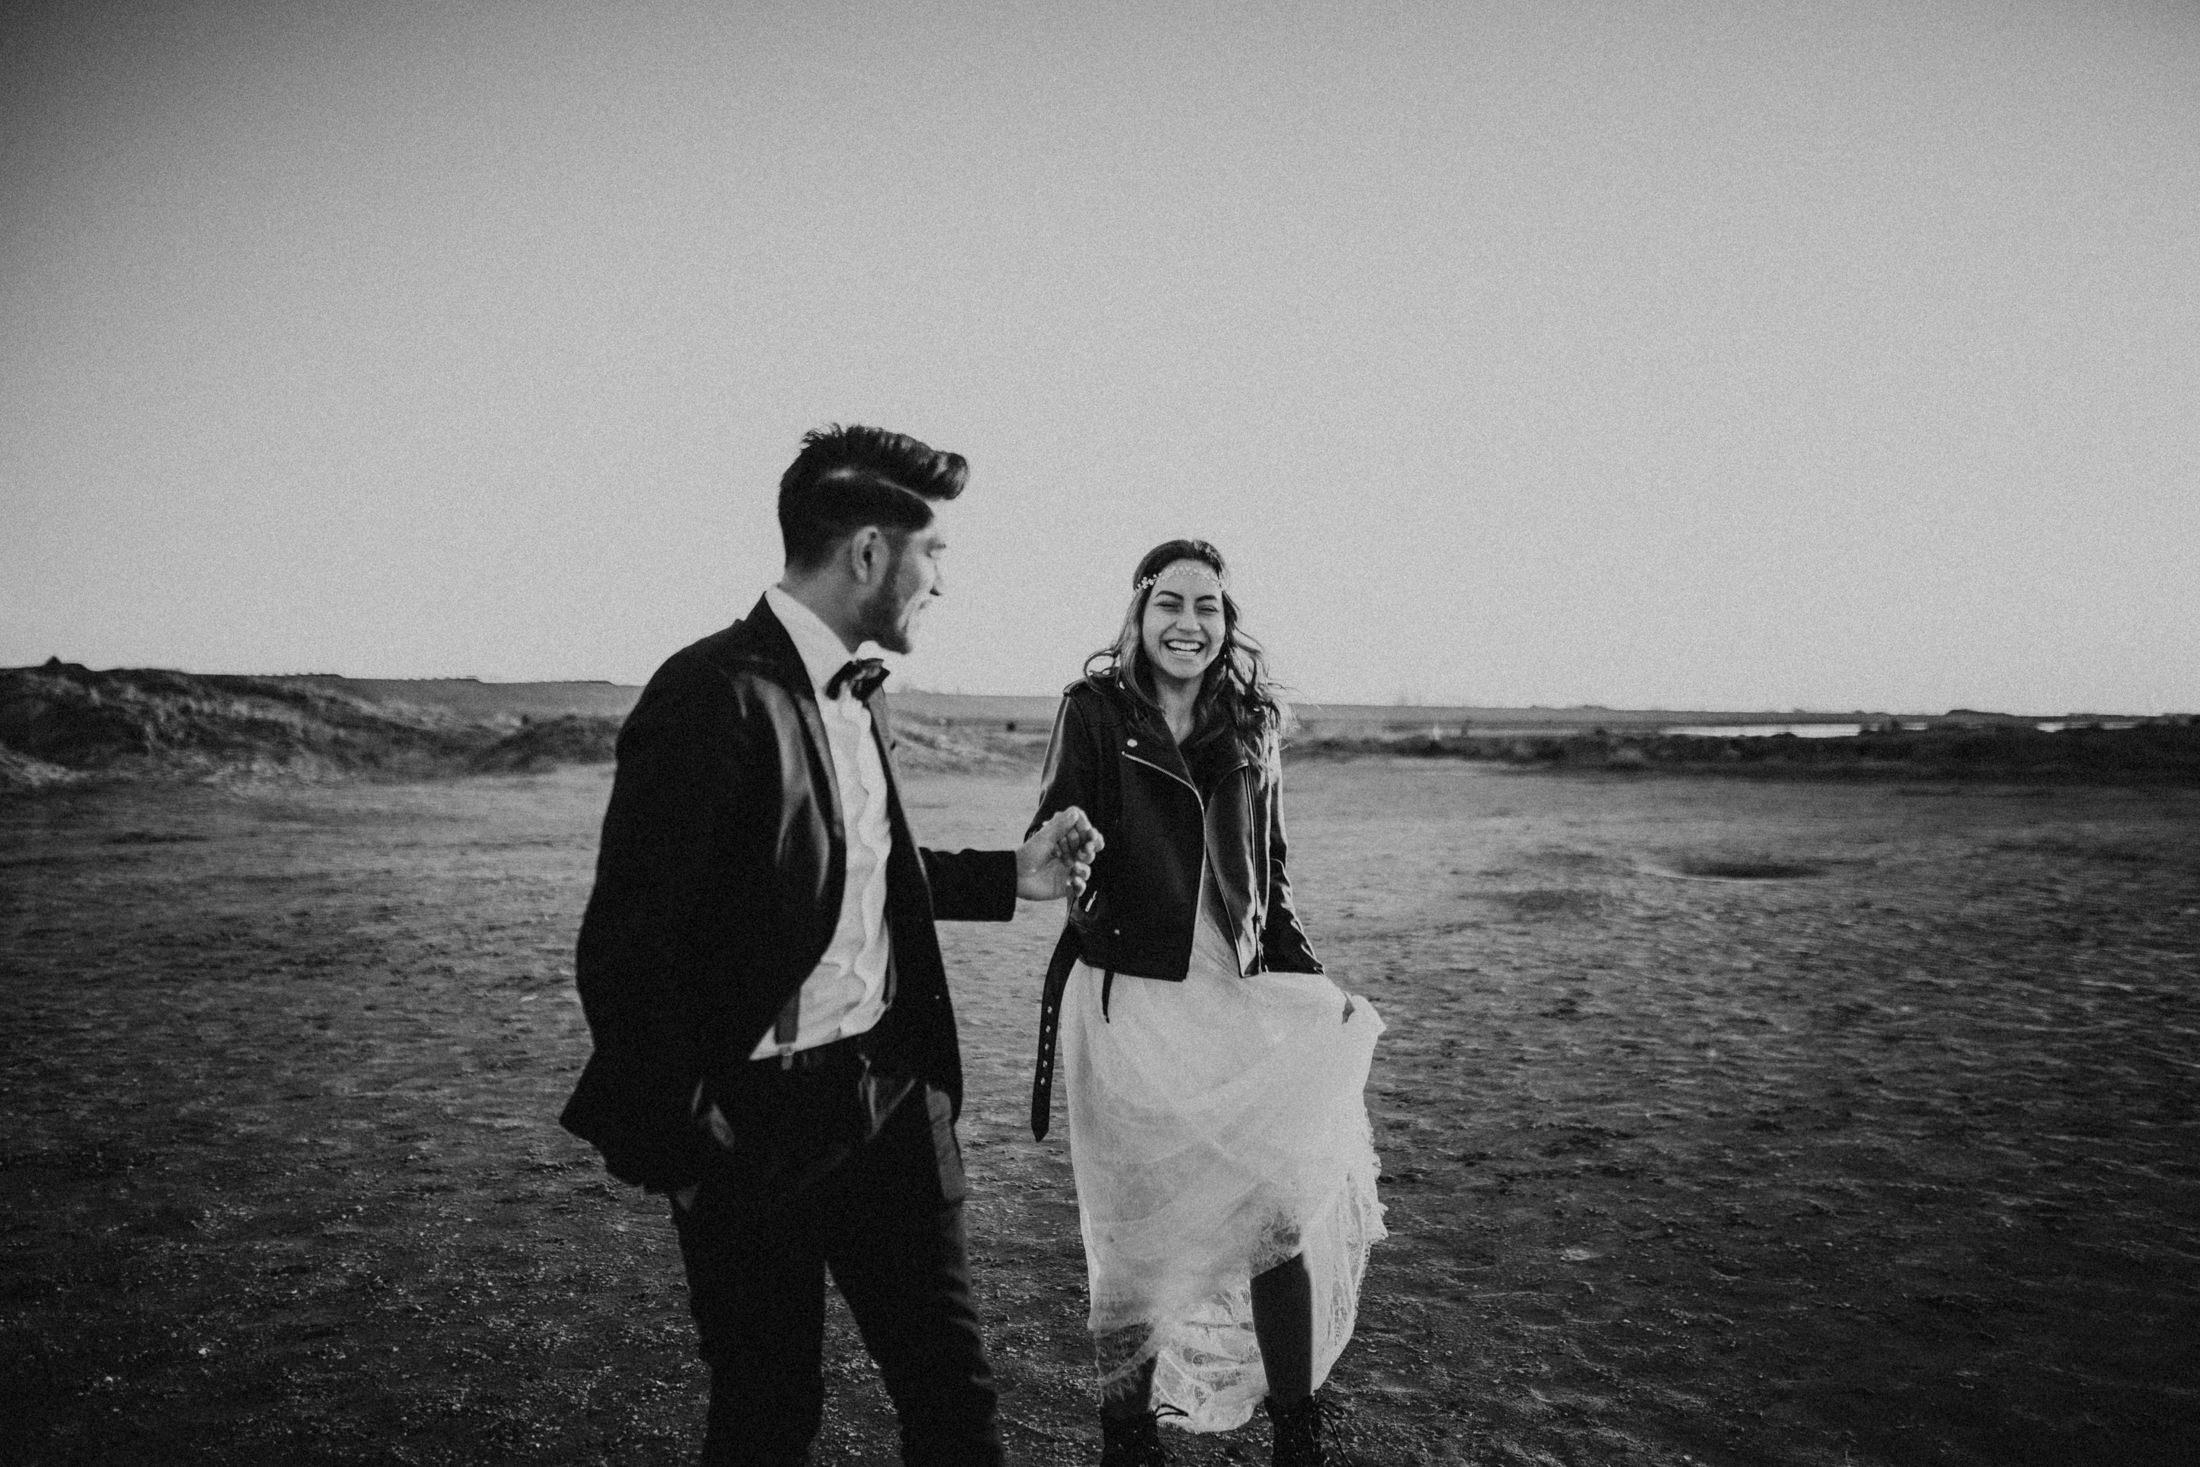 Wedding_Photographer_Mallorca_Daniela-Marquardt_Photography_CanaryIslands_Lanzarote_Iceland_Tuskany_Santorini_Portugal_Schweiz_Austria_Bayern_Elopement_Hochzeitsfotograf_Norddeichich_81